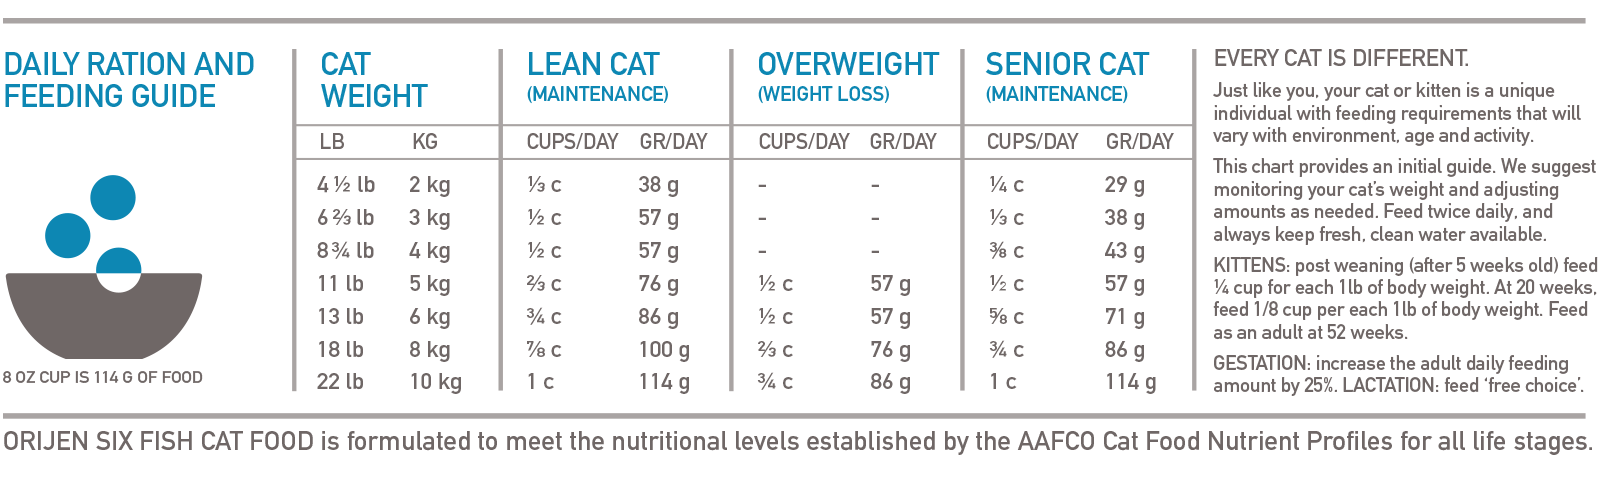 ORIJEN Six Fish Biologically Appropriate Cat Food Feeding Chart